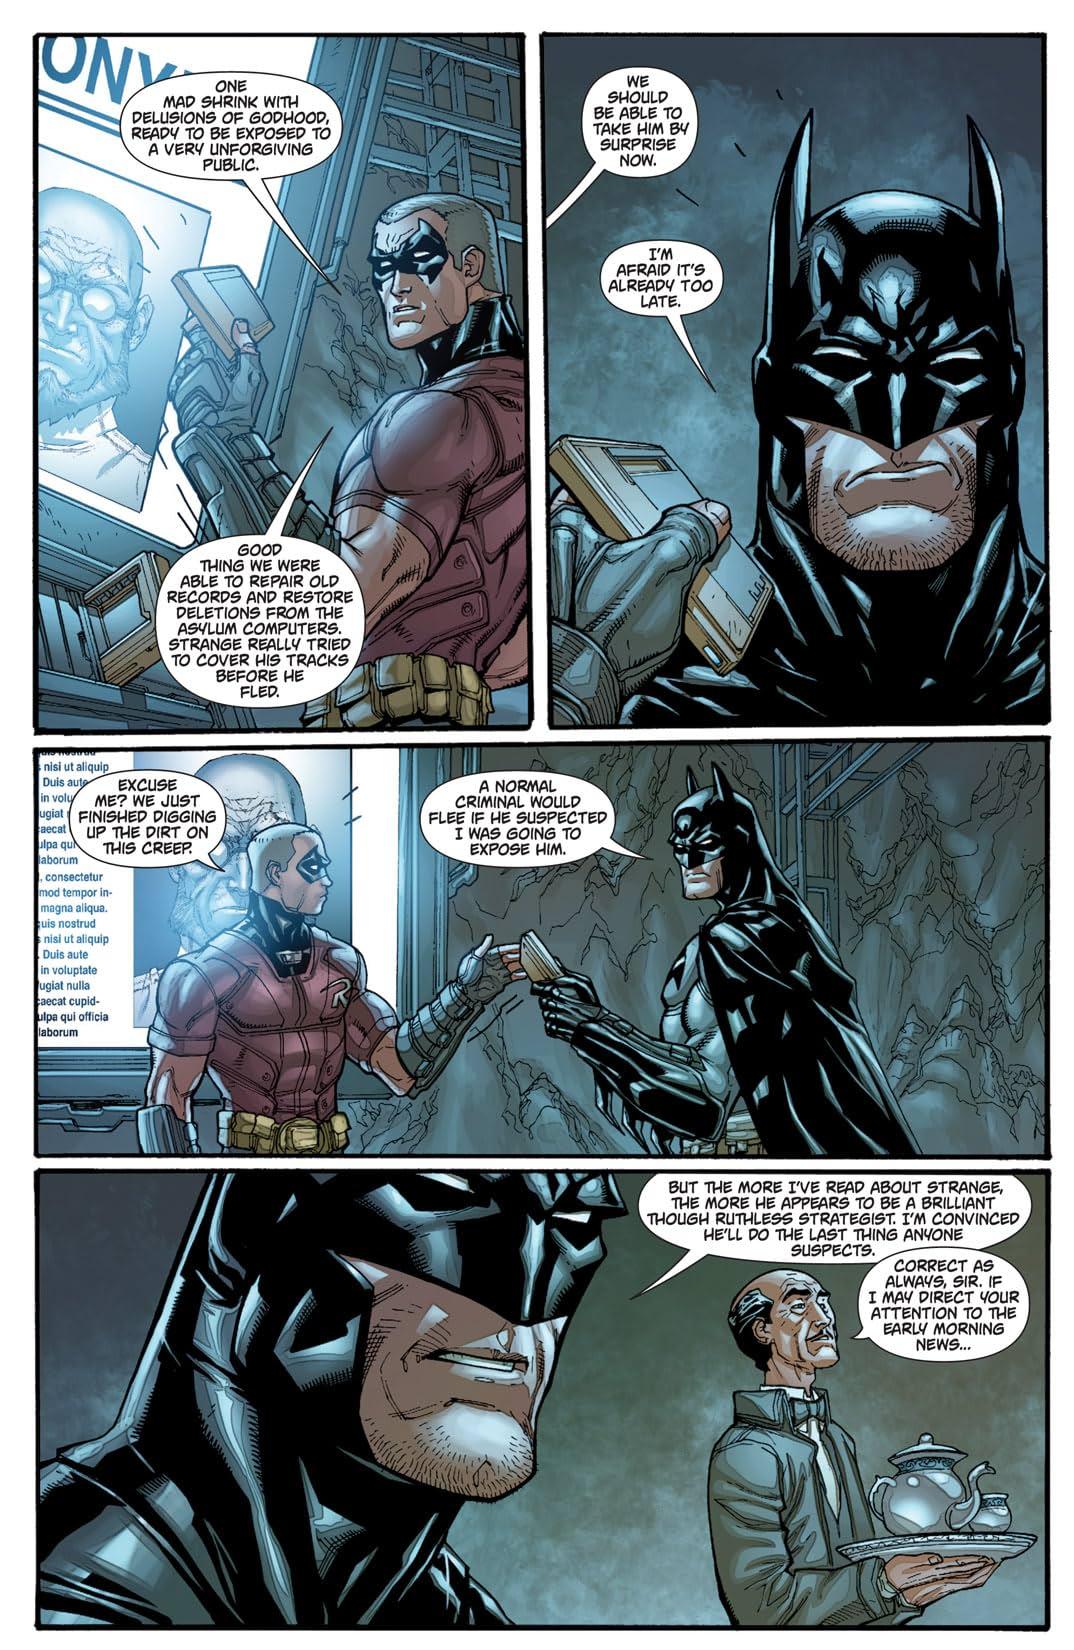 Batman: Arkham City #5 (of 5)